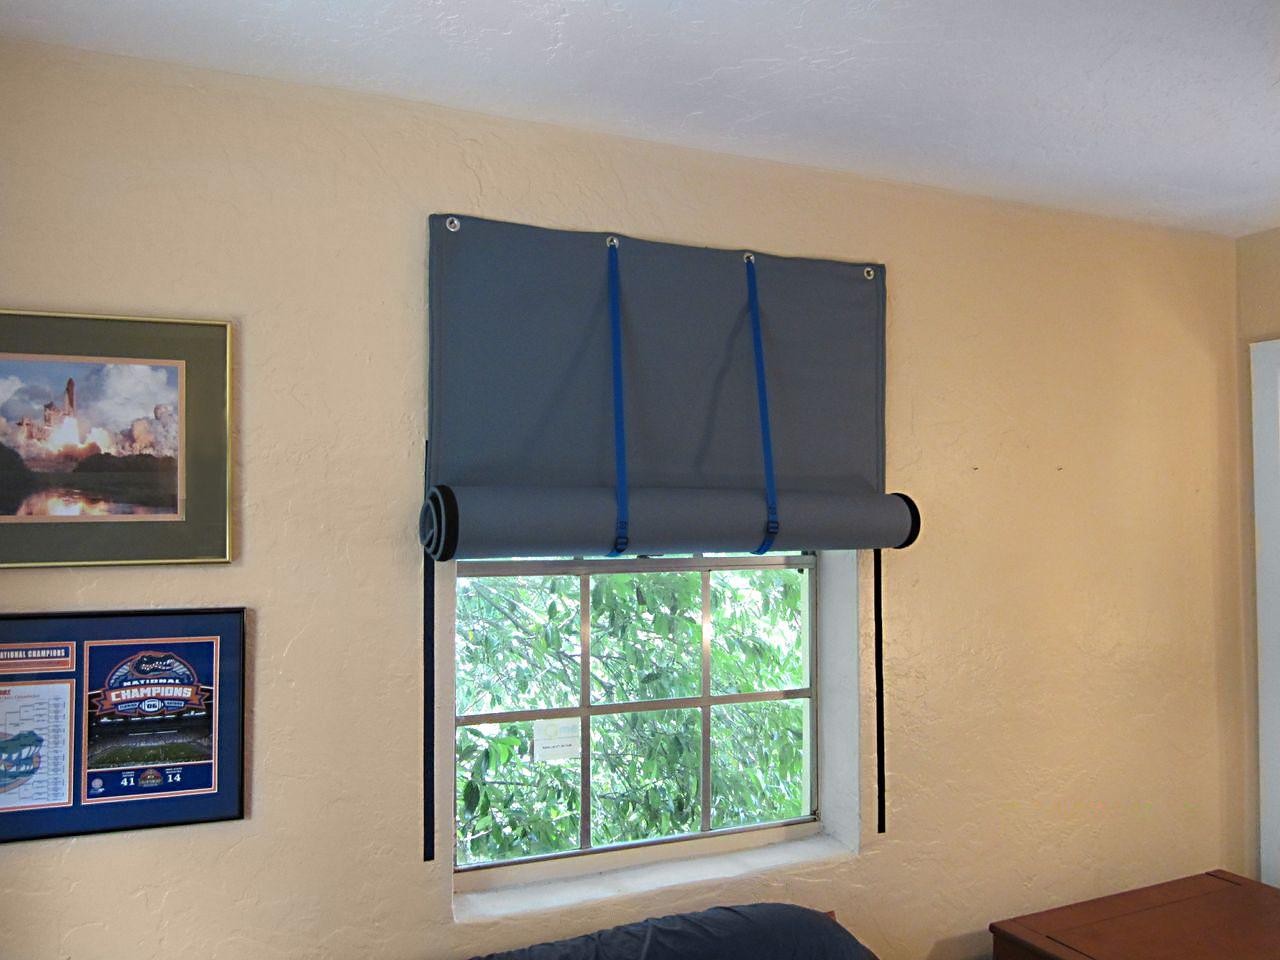 sound blocking curtains keep the